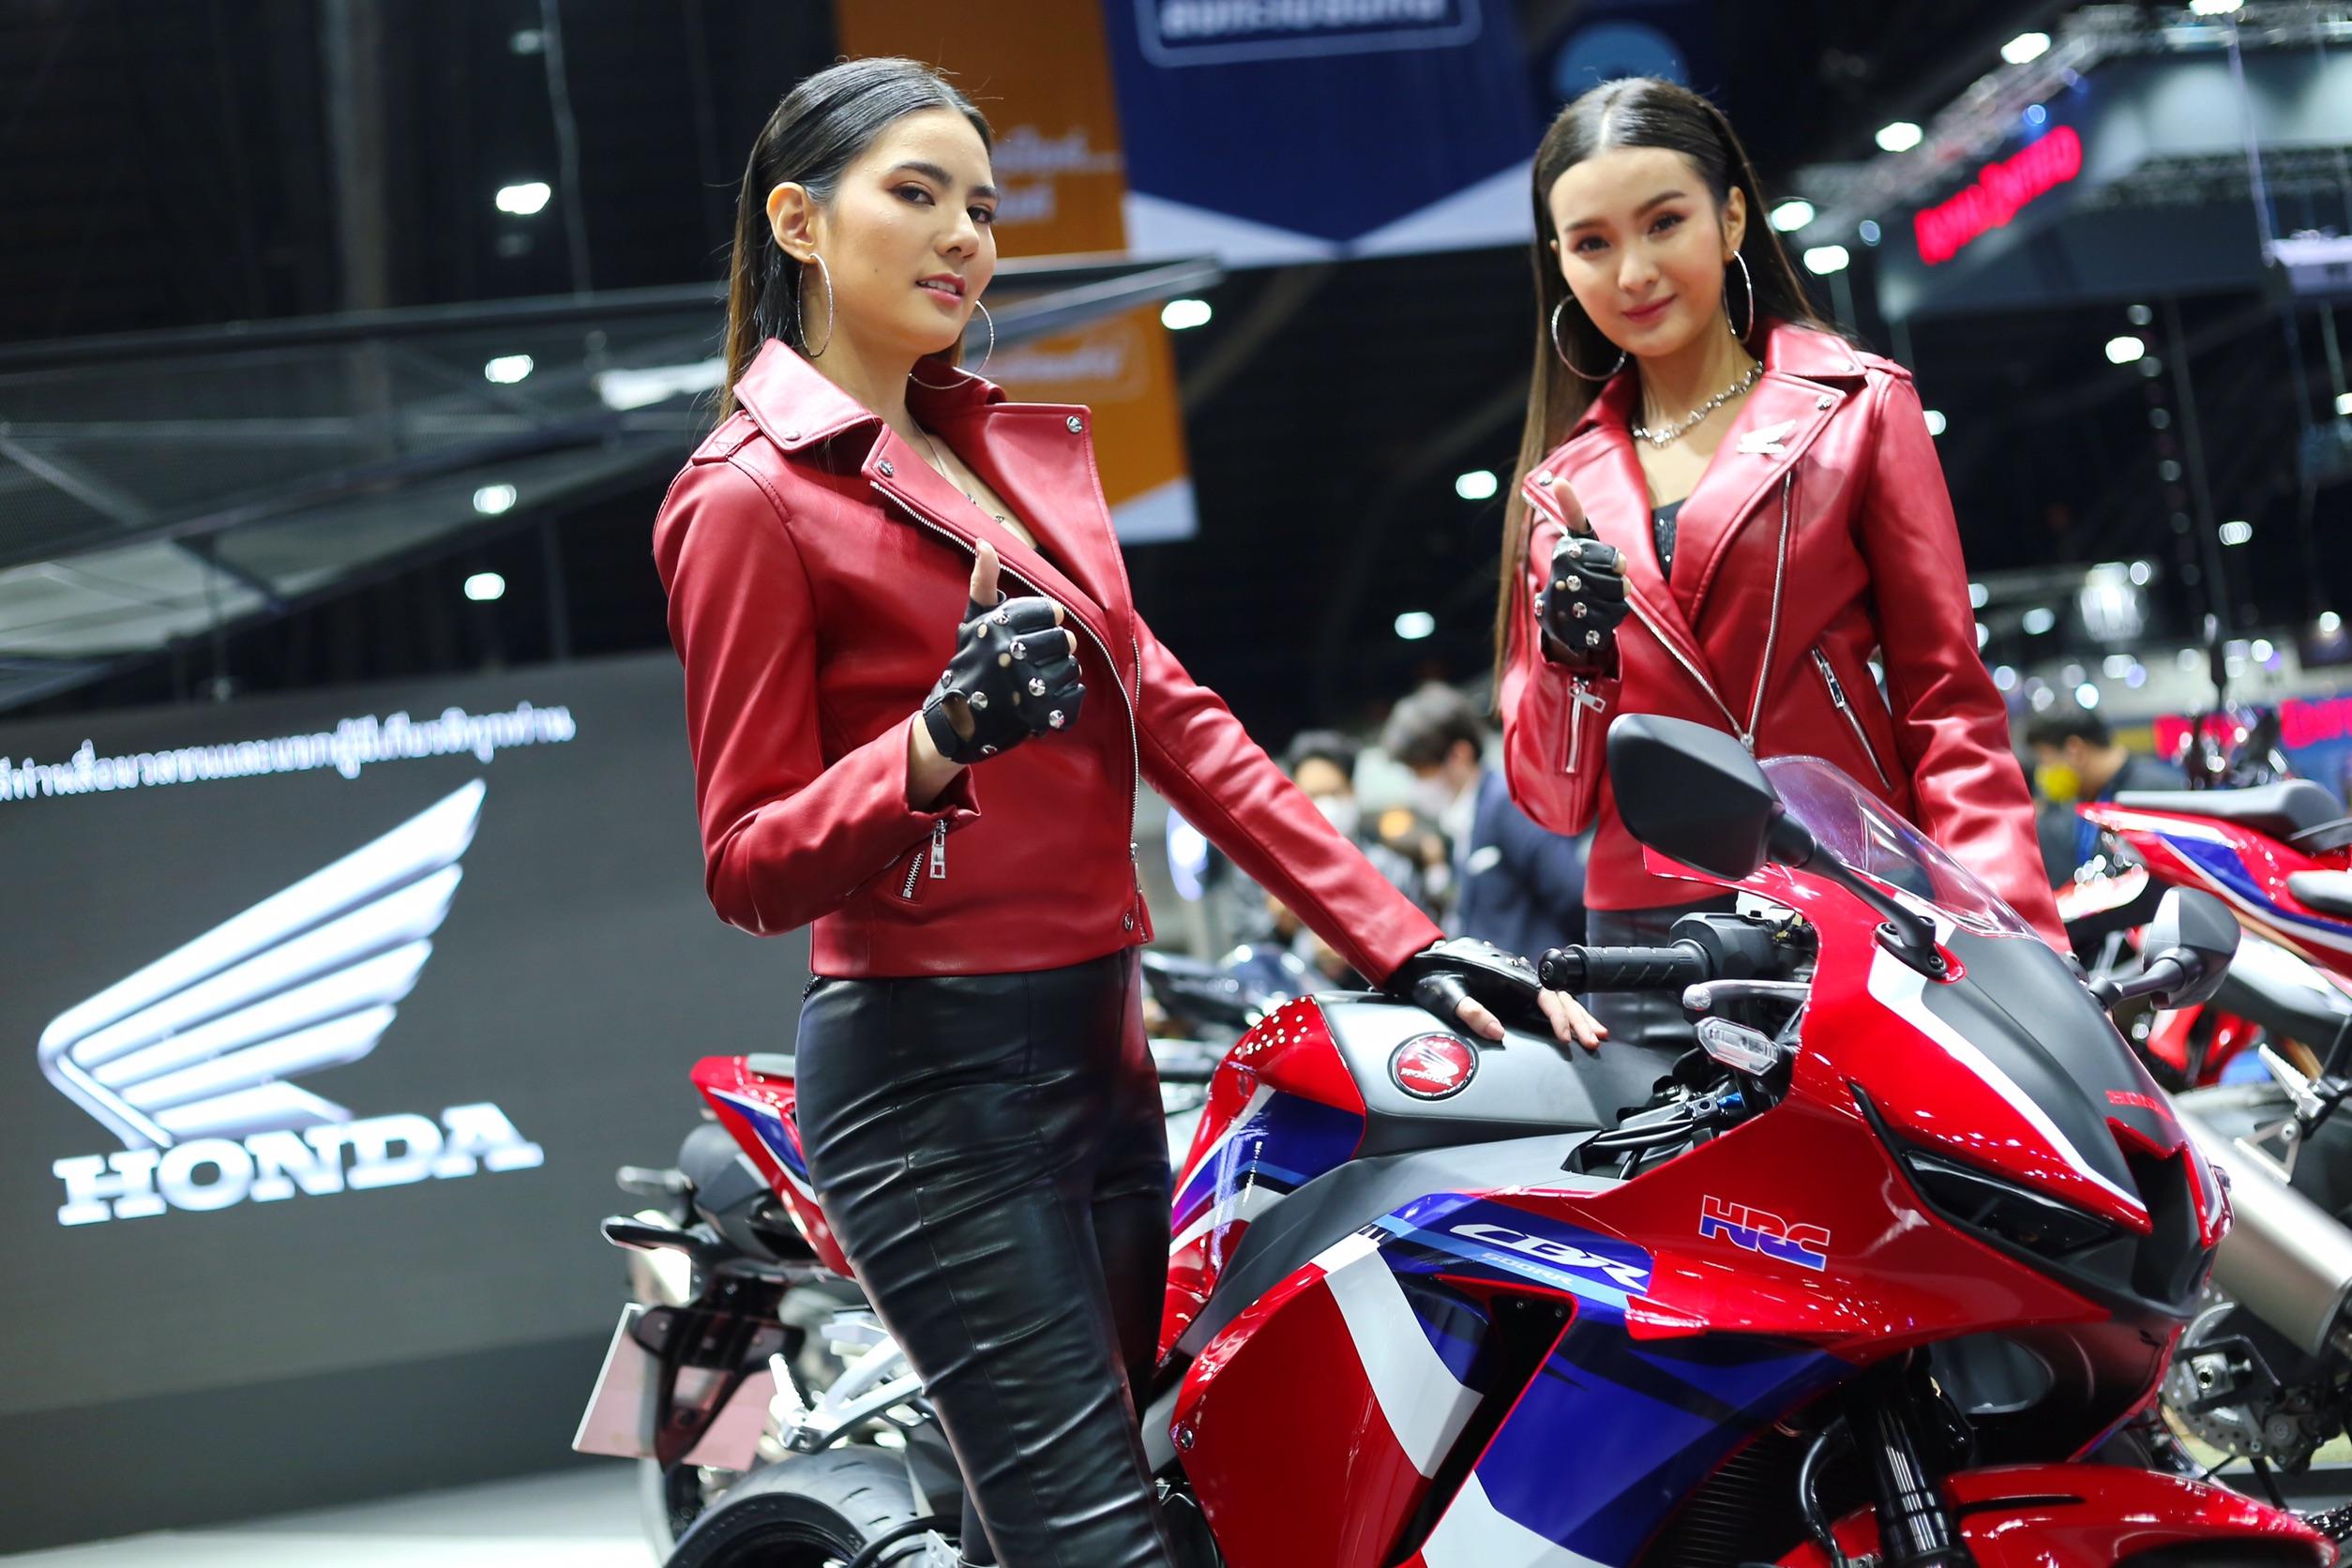 Gundam ก มา Honda ยกท พโมเดลใหม บ ก Motor Expo 2020 December 1 12 2021 The 38th Thailand International Motor Expo 2021